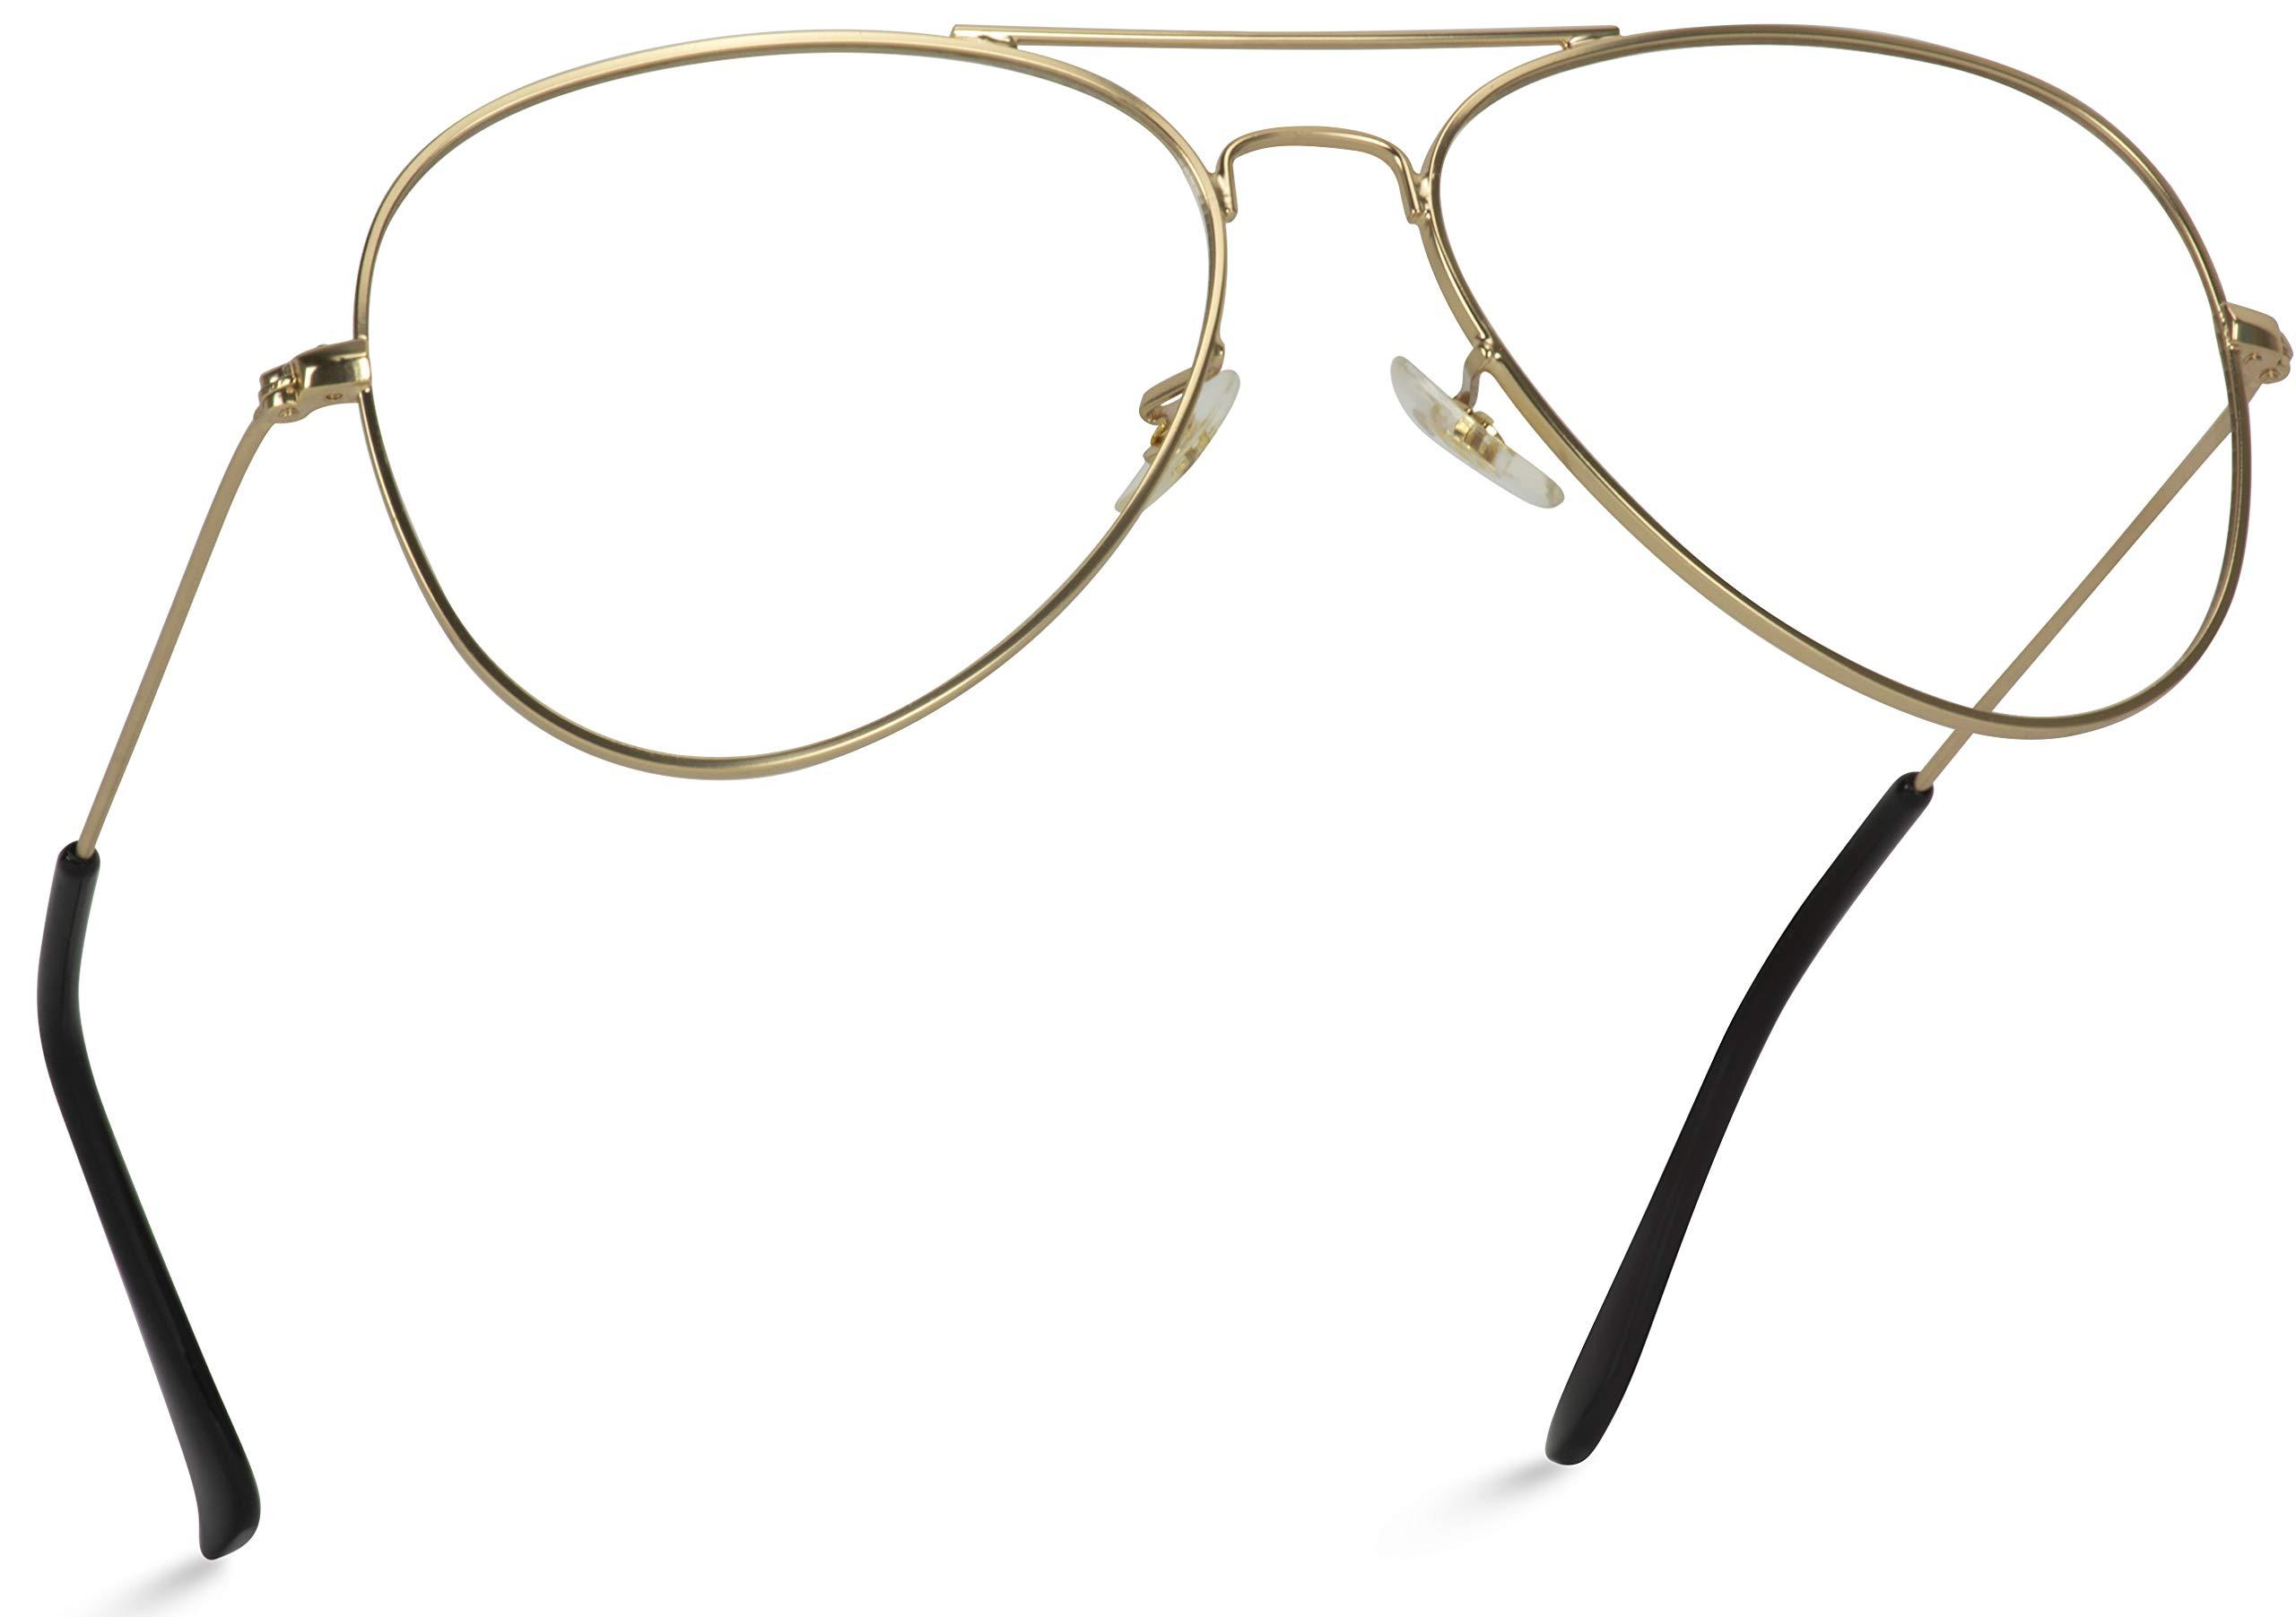 WearMe Pro - Premium Elegant Metal Frame Retro Vintage Aviator Glasses by WearMe Pro